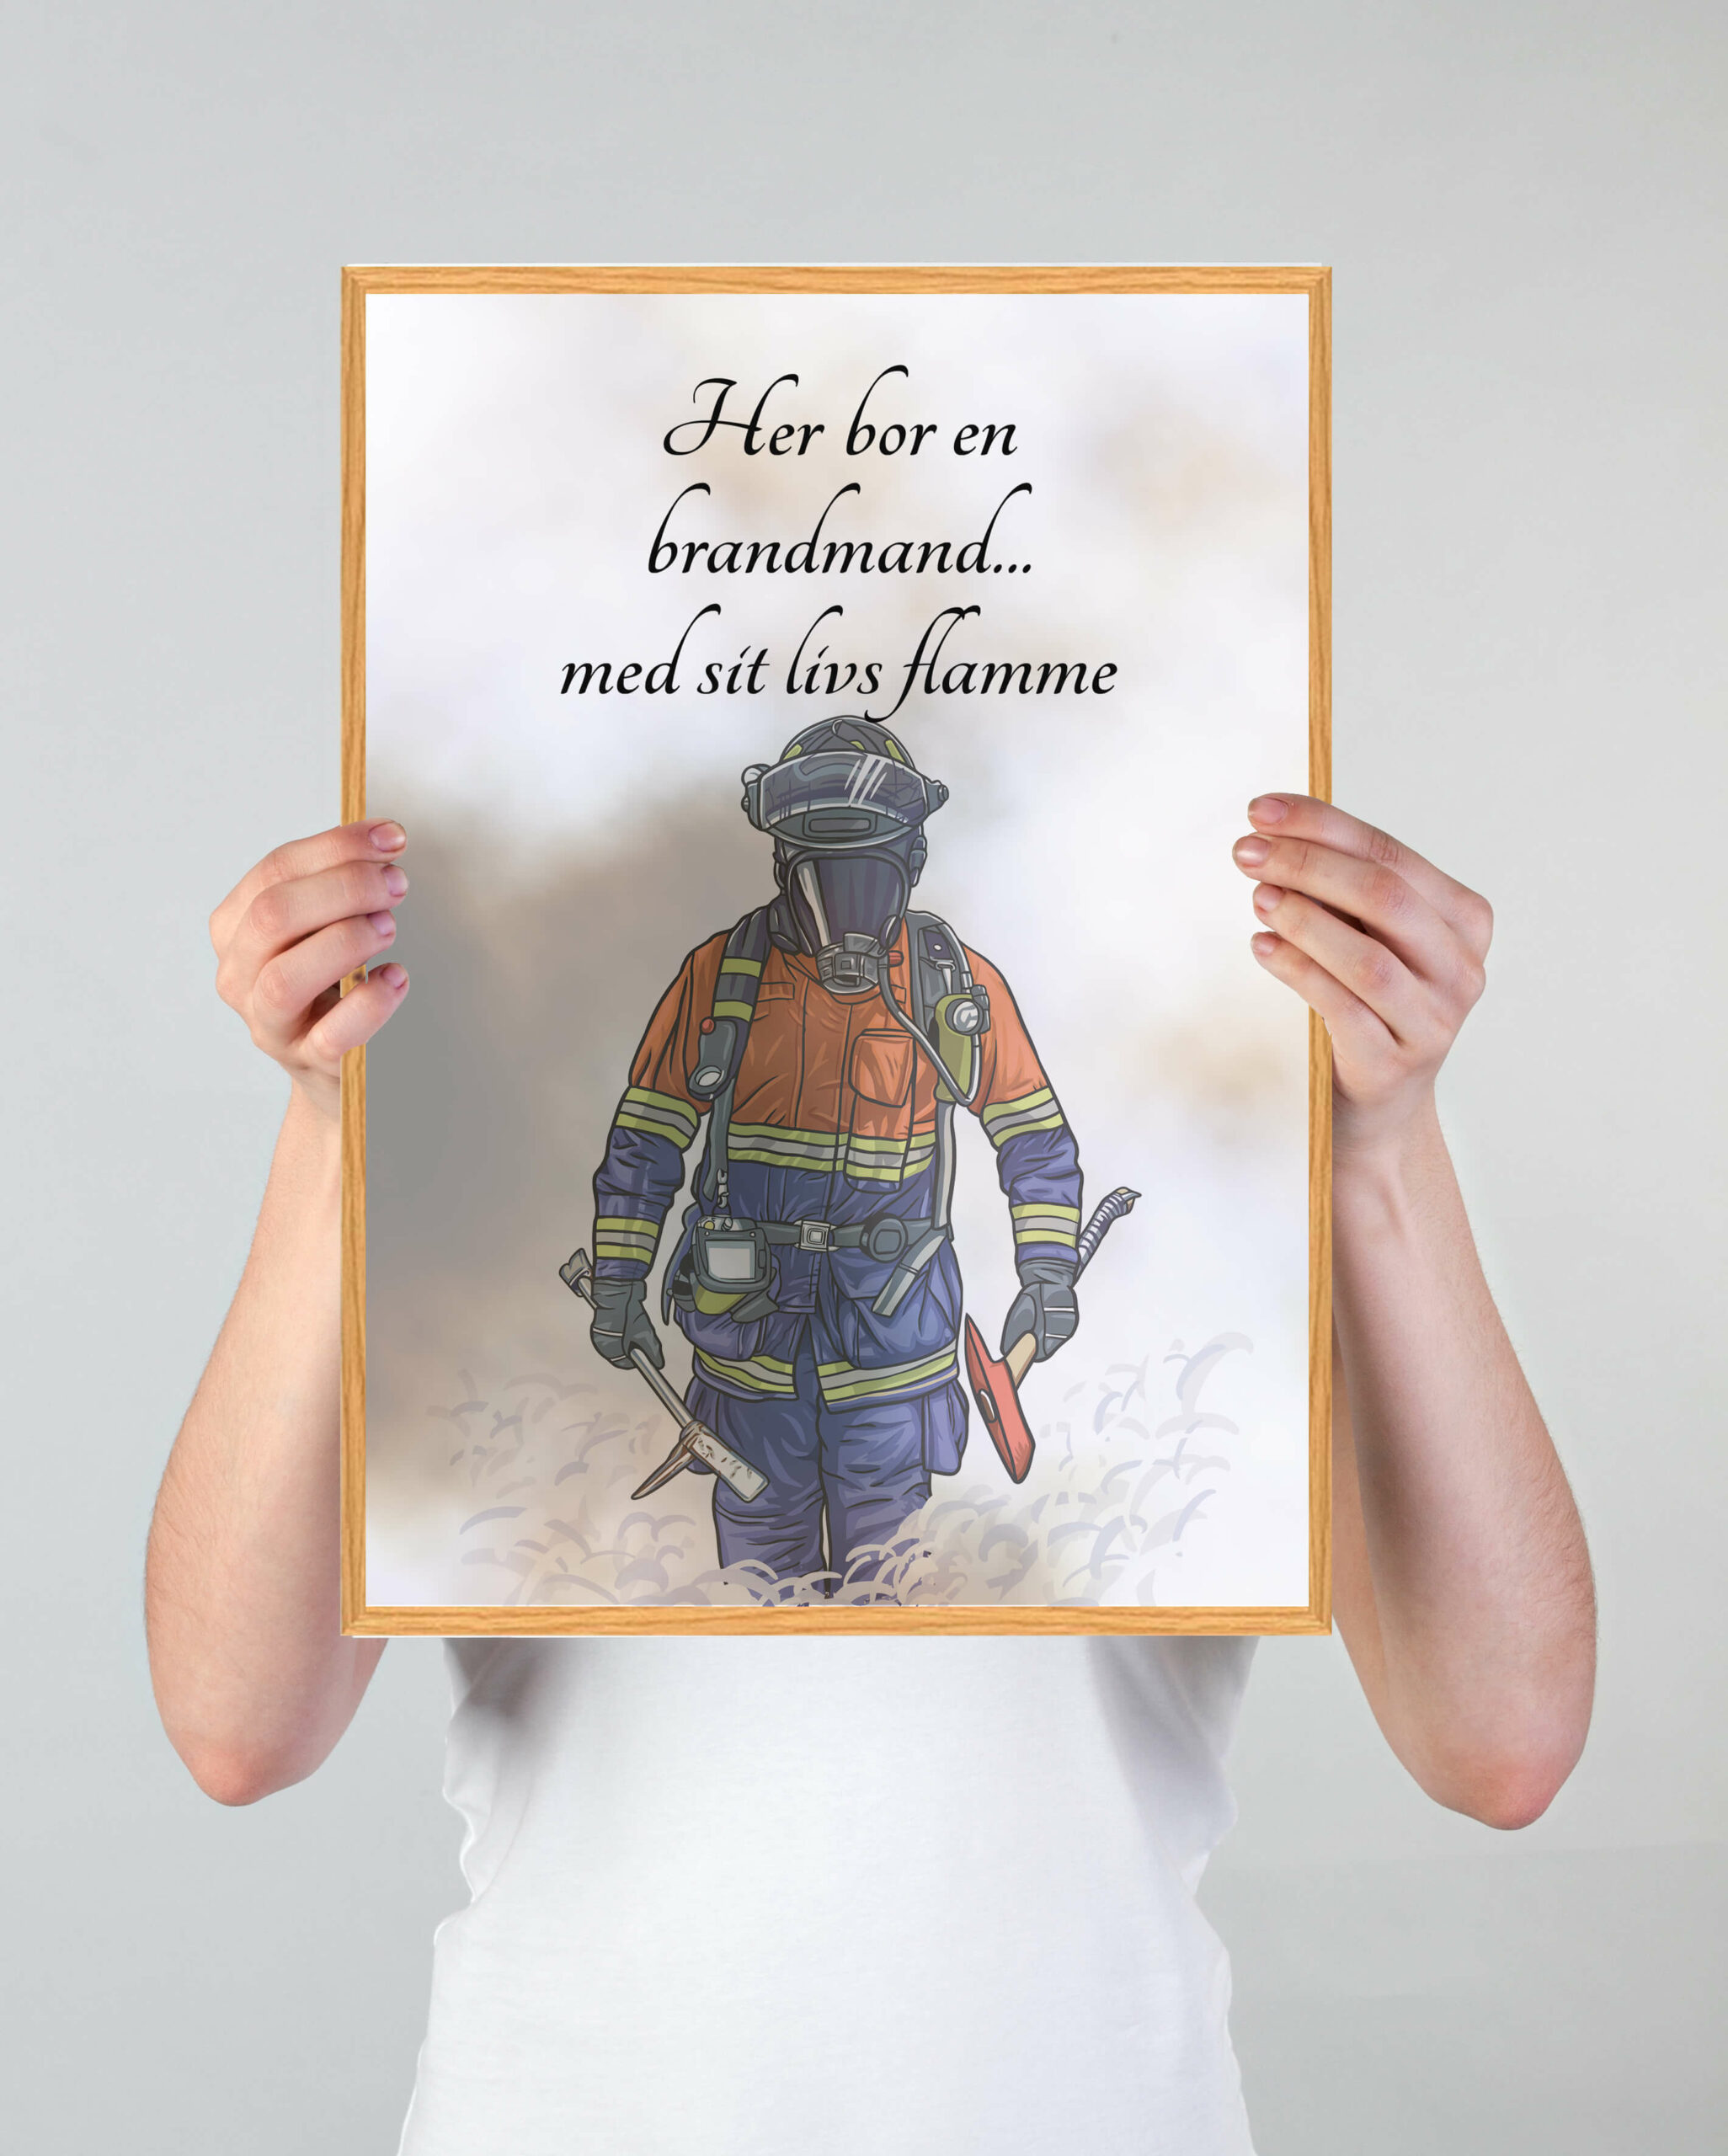 brandmand-flamme-plakat-1